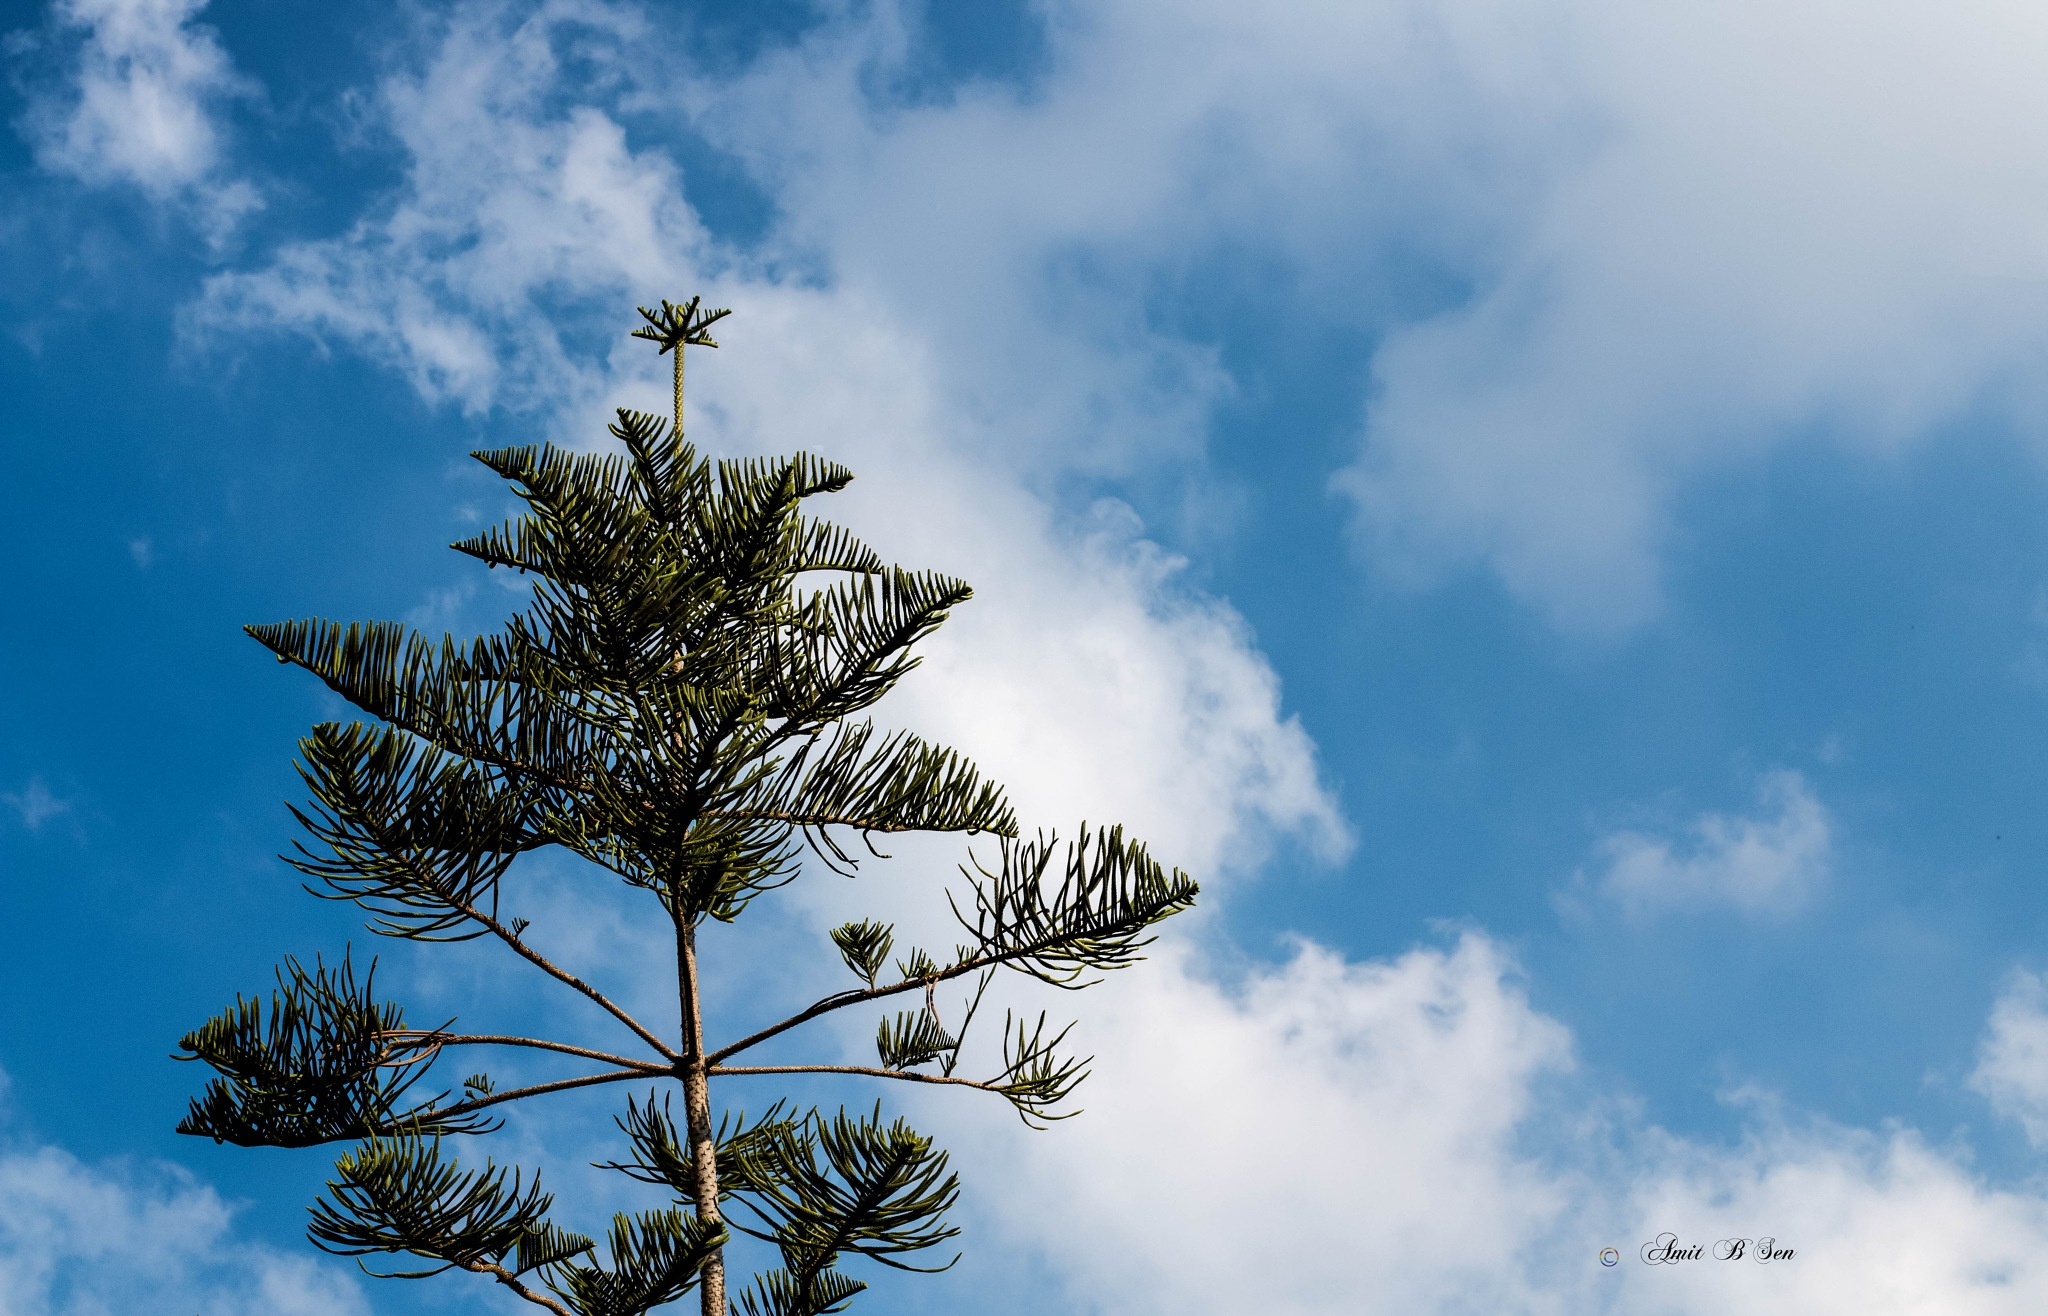 Towards sky by Amit Baran Sen